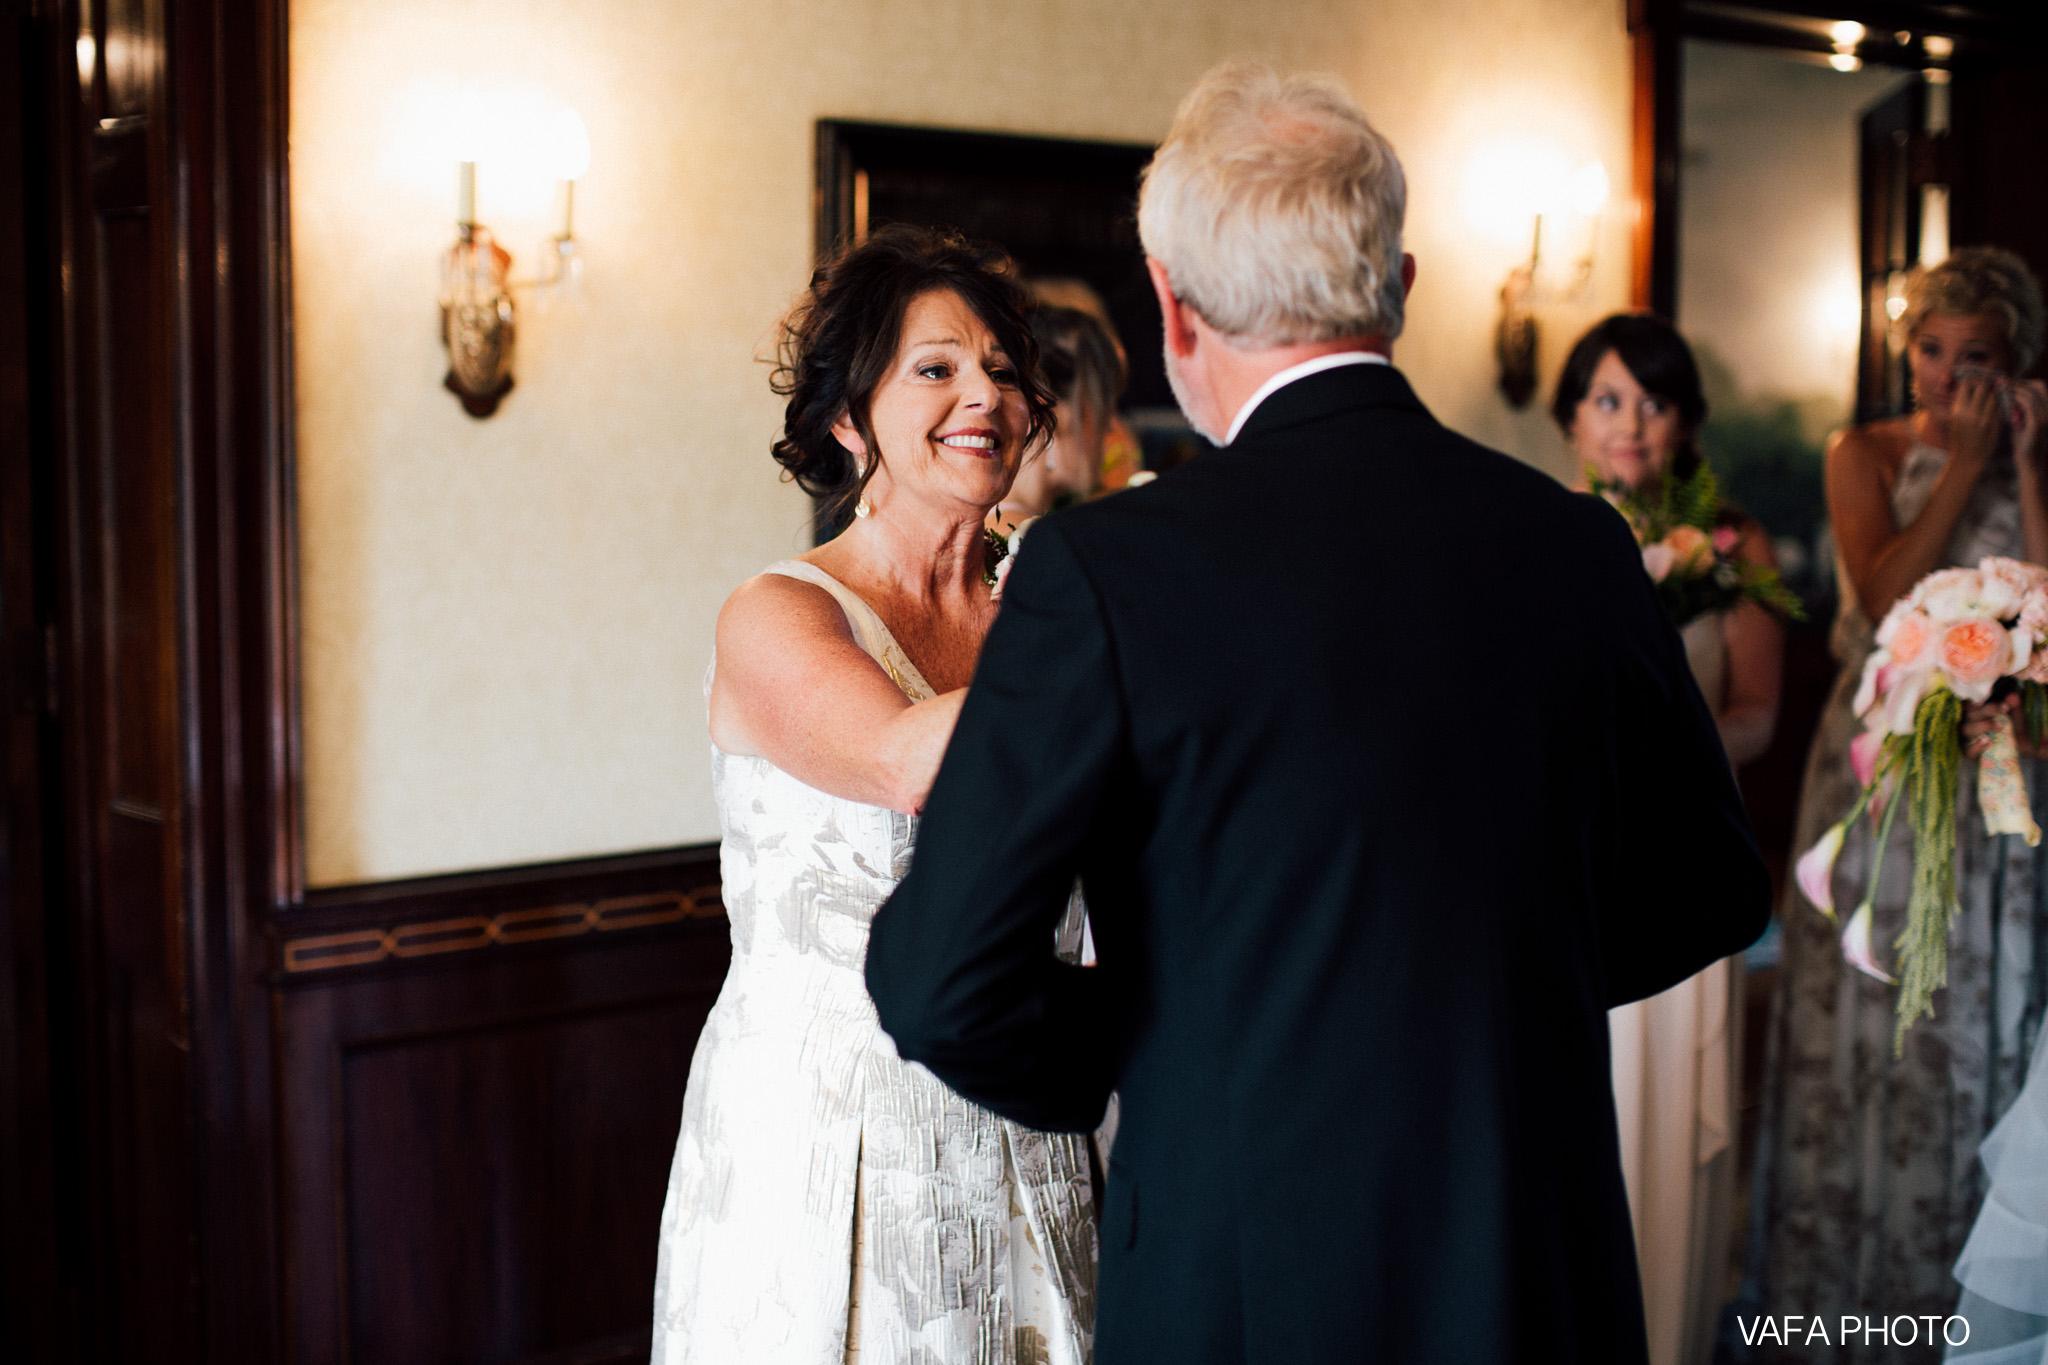 The-Felt-Estate-Wedding-Kailie-David-Vafa-Photo-190.jpg